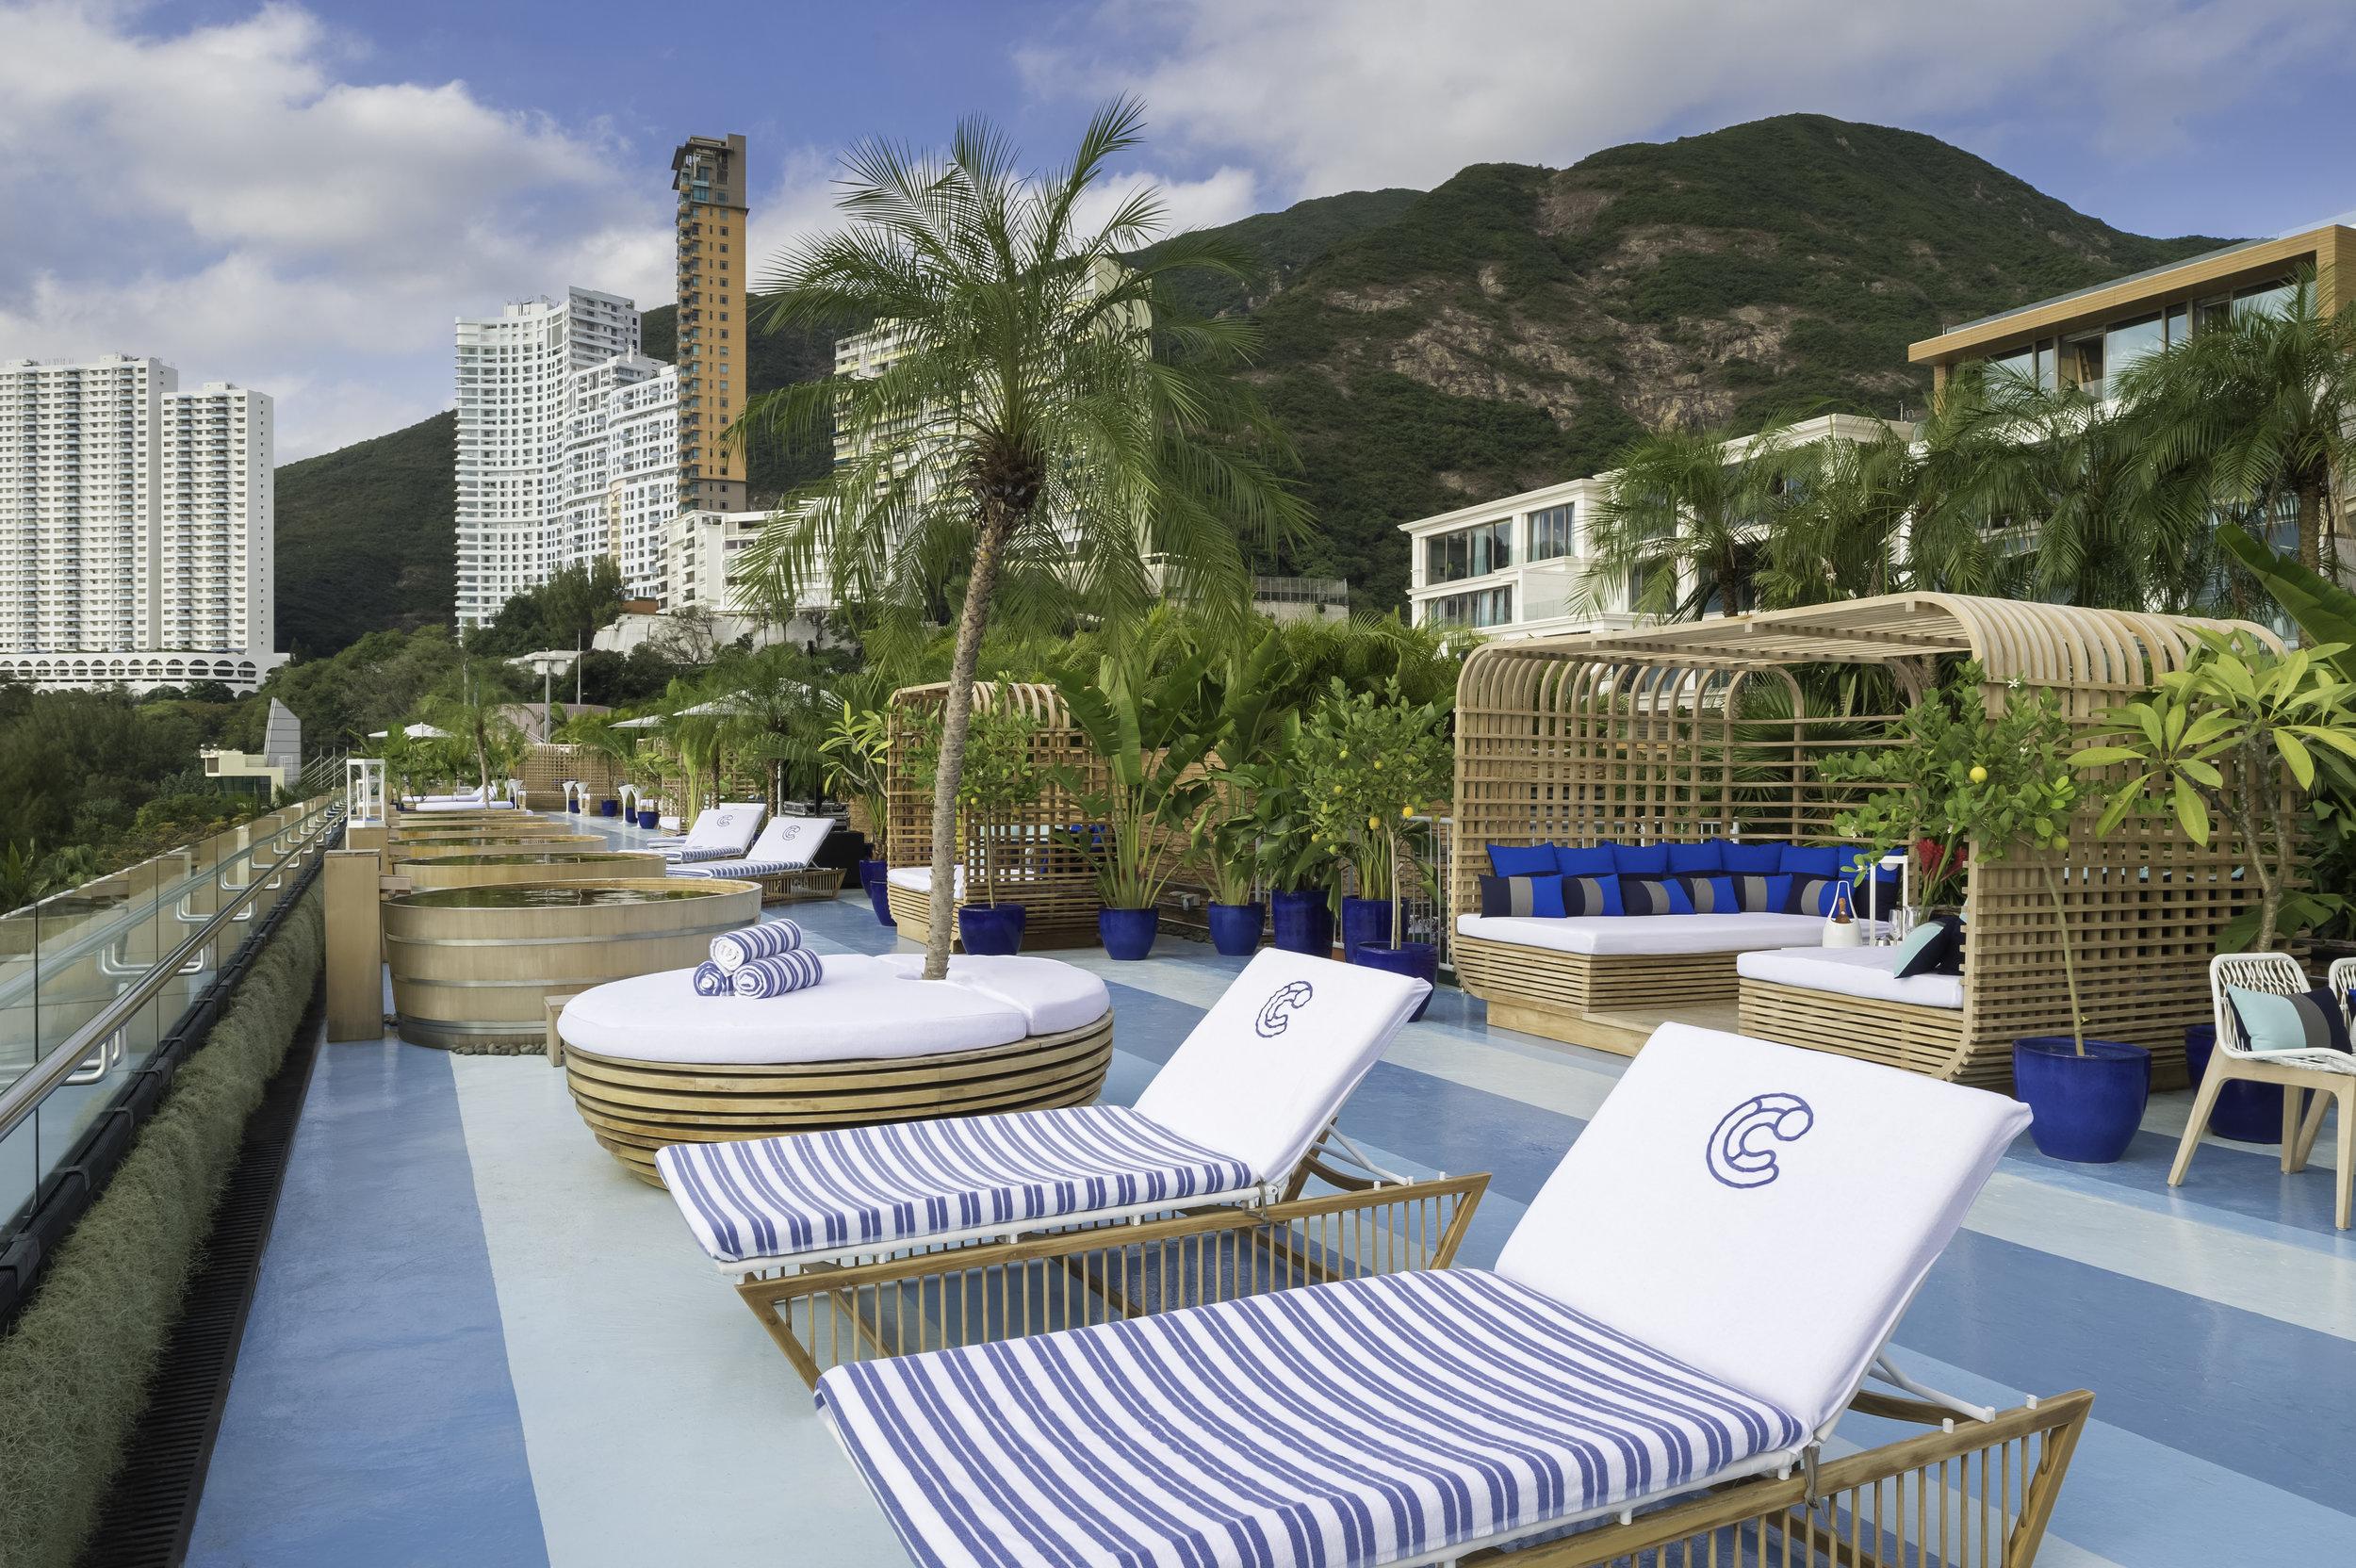 Cabana 20151211-008.jpg